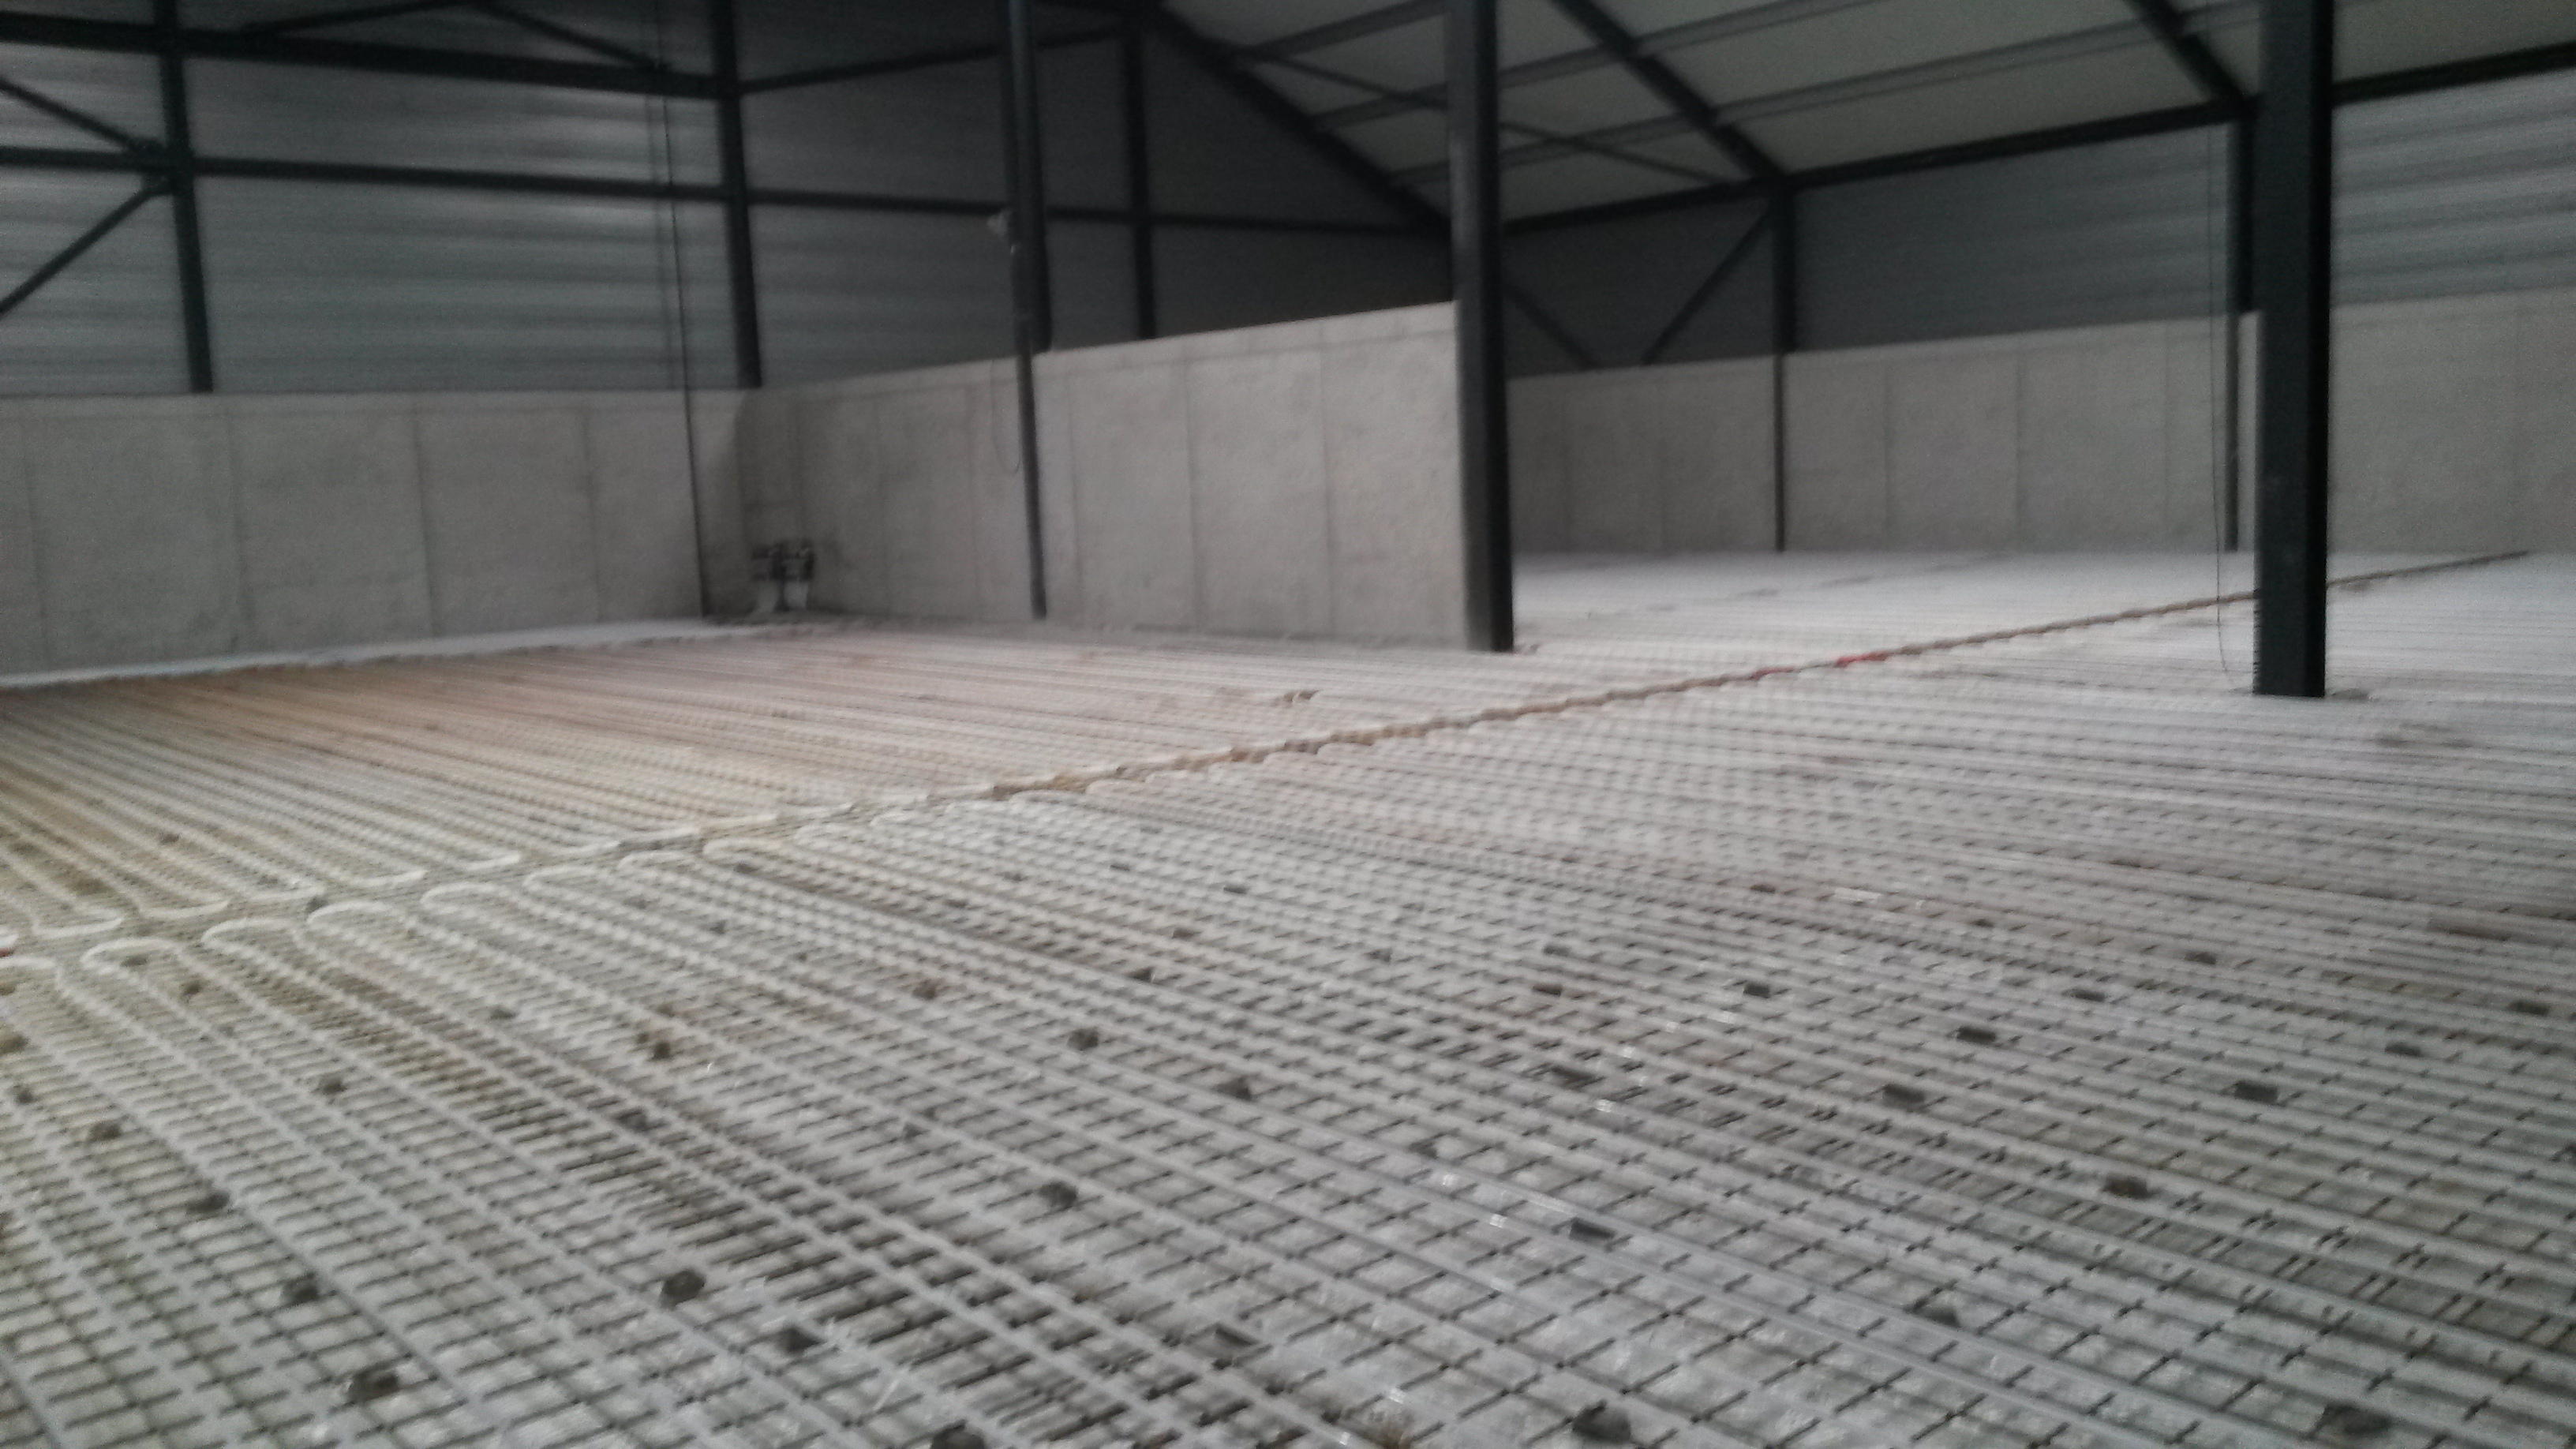 Vloerverwarmingleggen nl   Roy Steenbekkers Vloertechniek, Vloerverwarming aanleggen